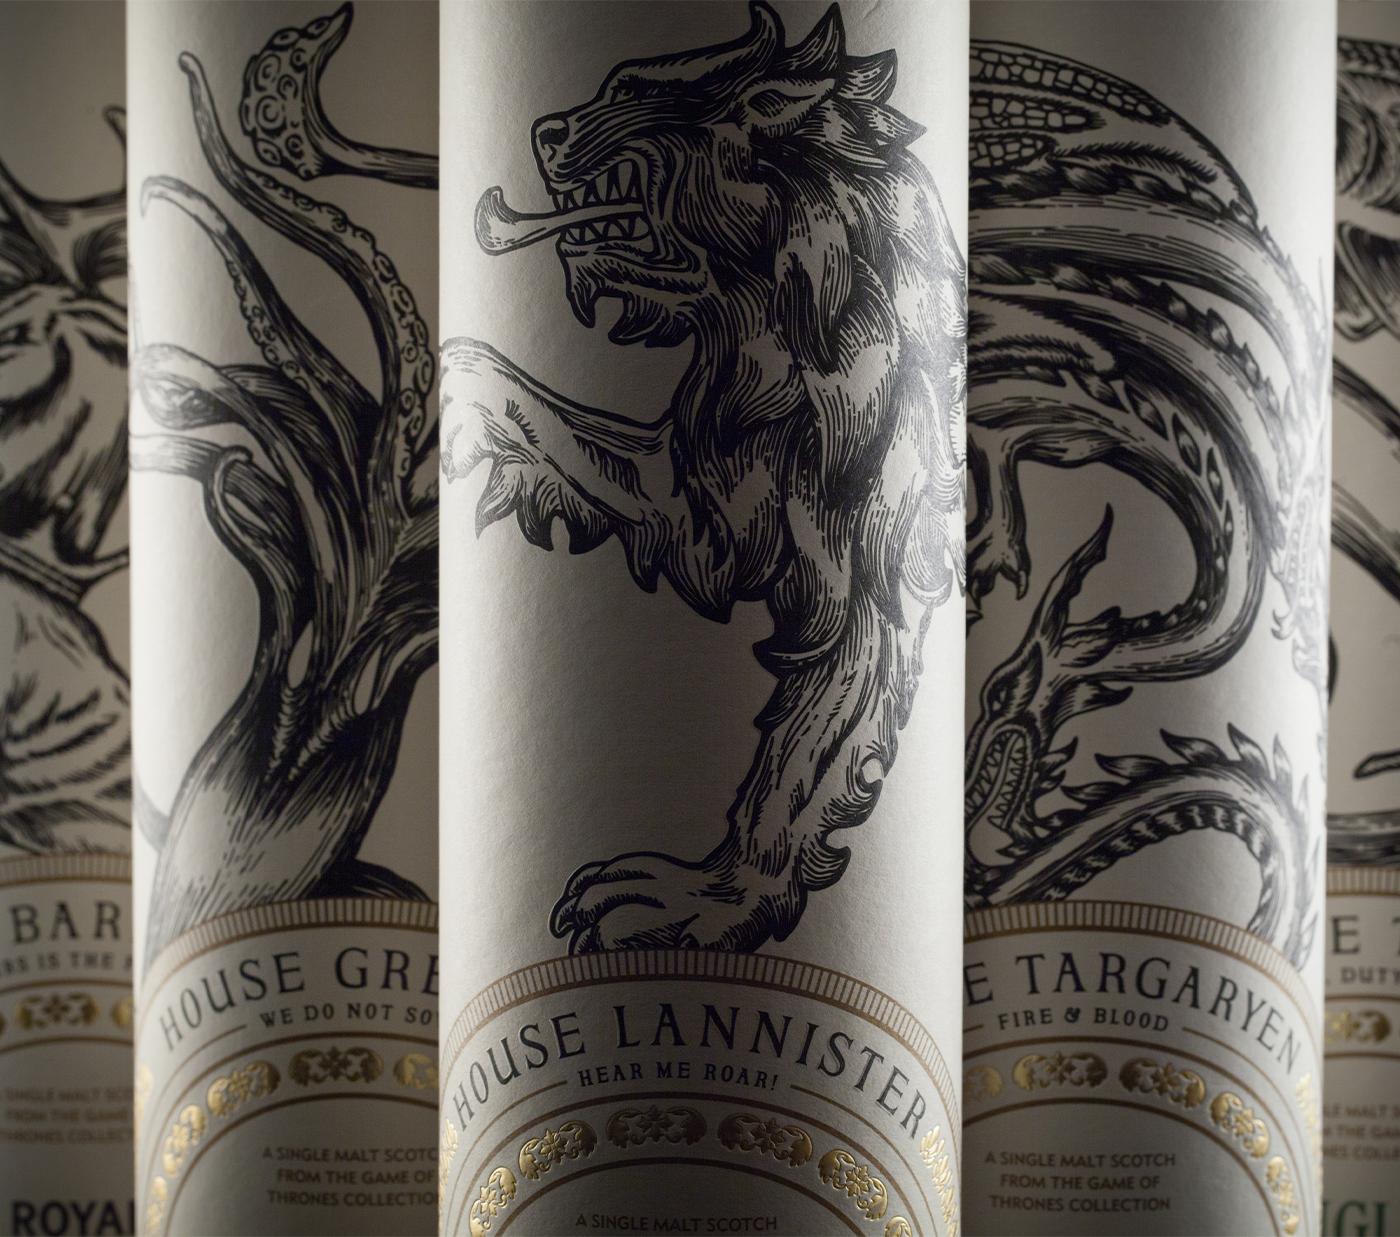 House Lannister Bottle Design